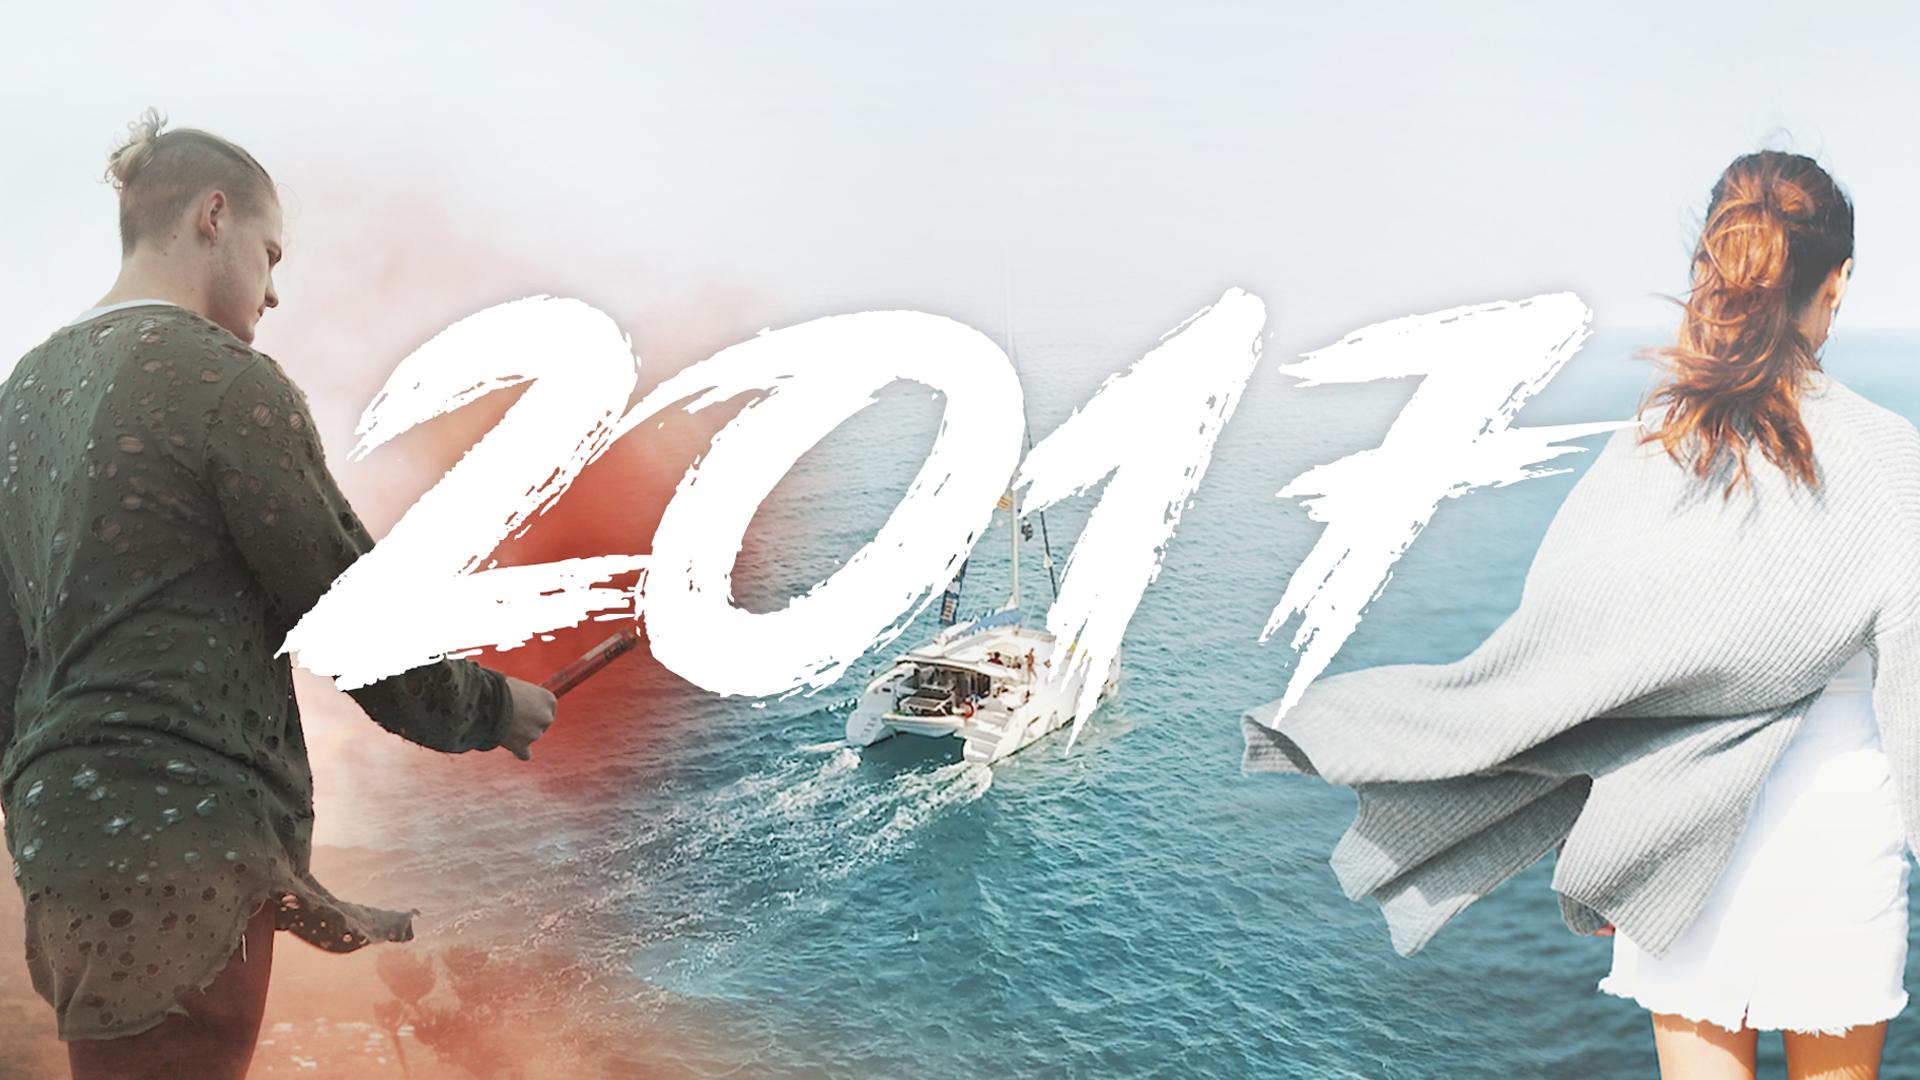 2017 Video Thumbnail (No Boarder).jpg